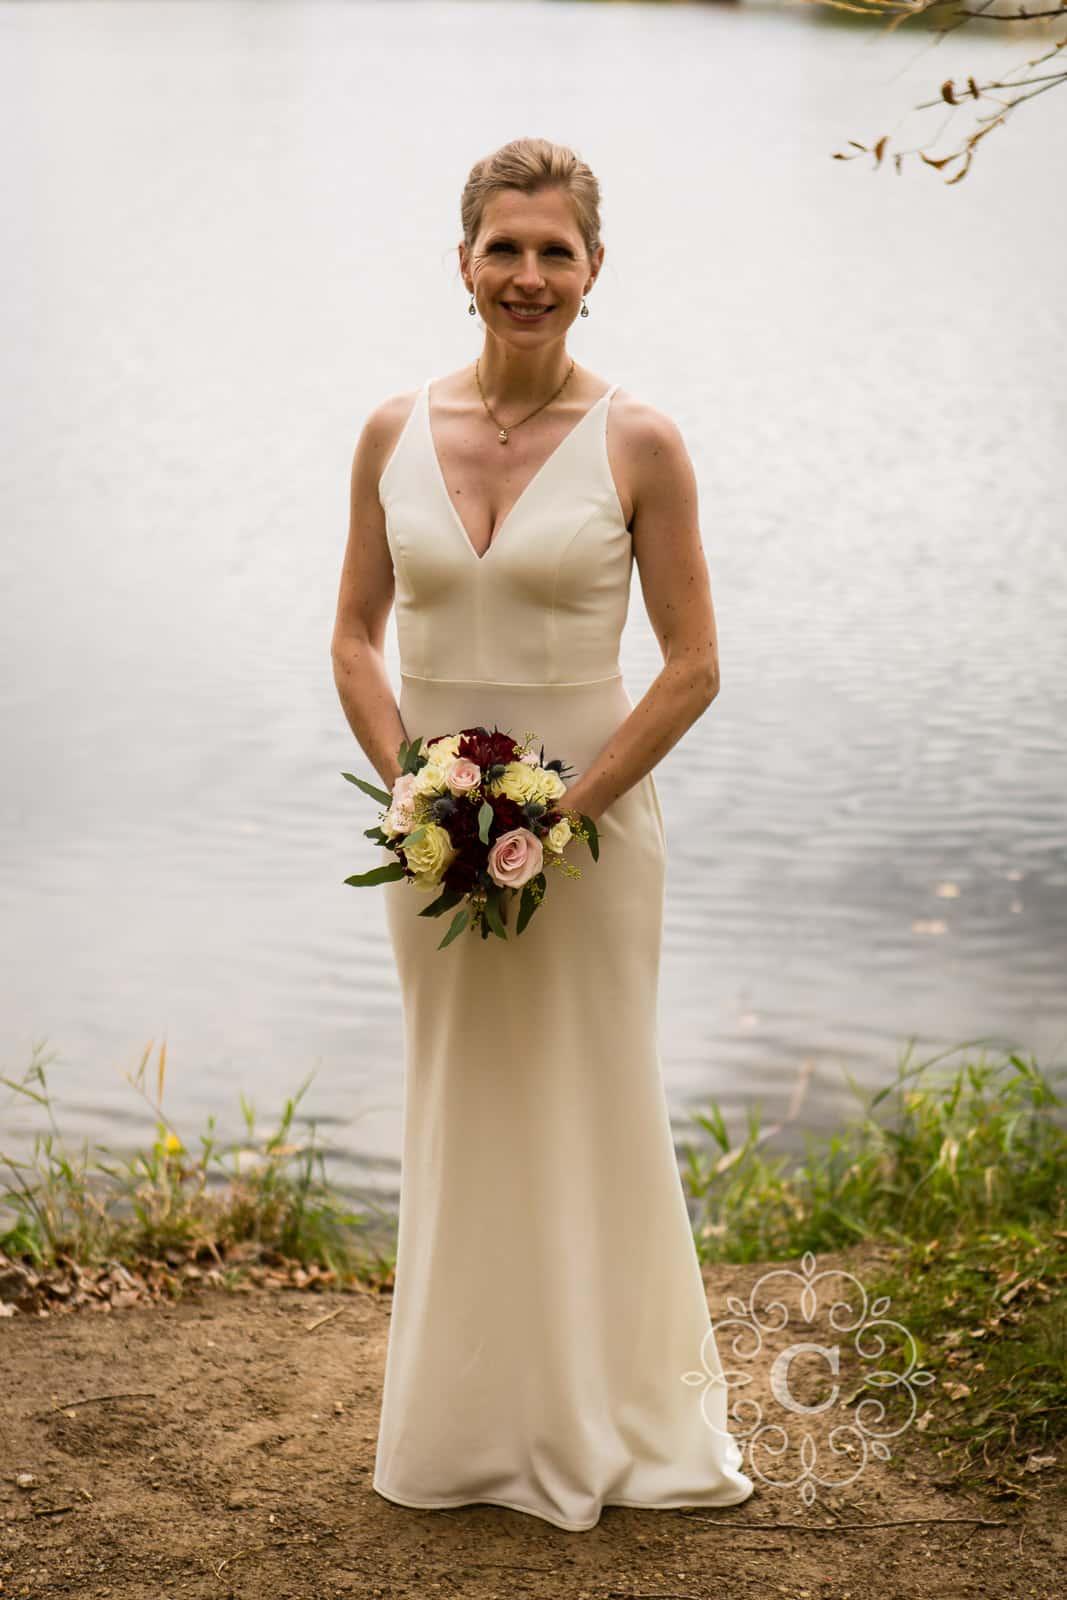 Minnesota Lakeside Back Yard Wedding Photo